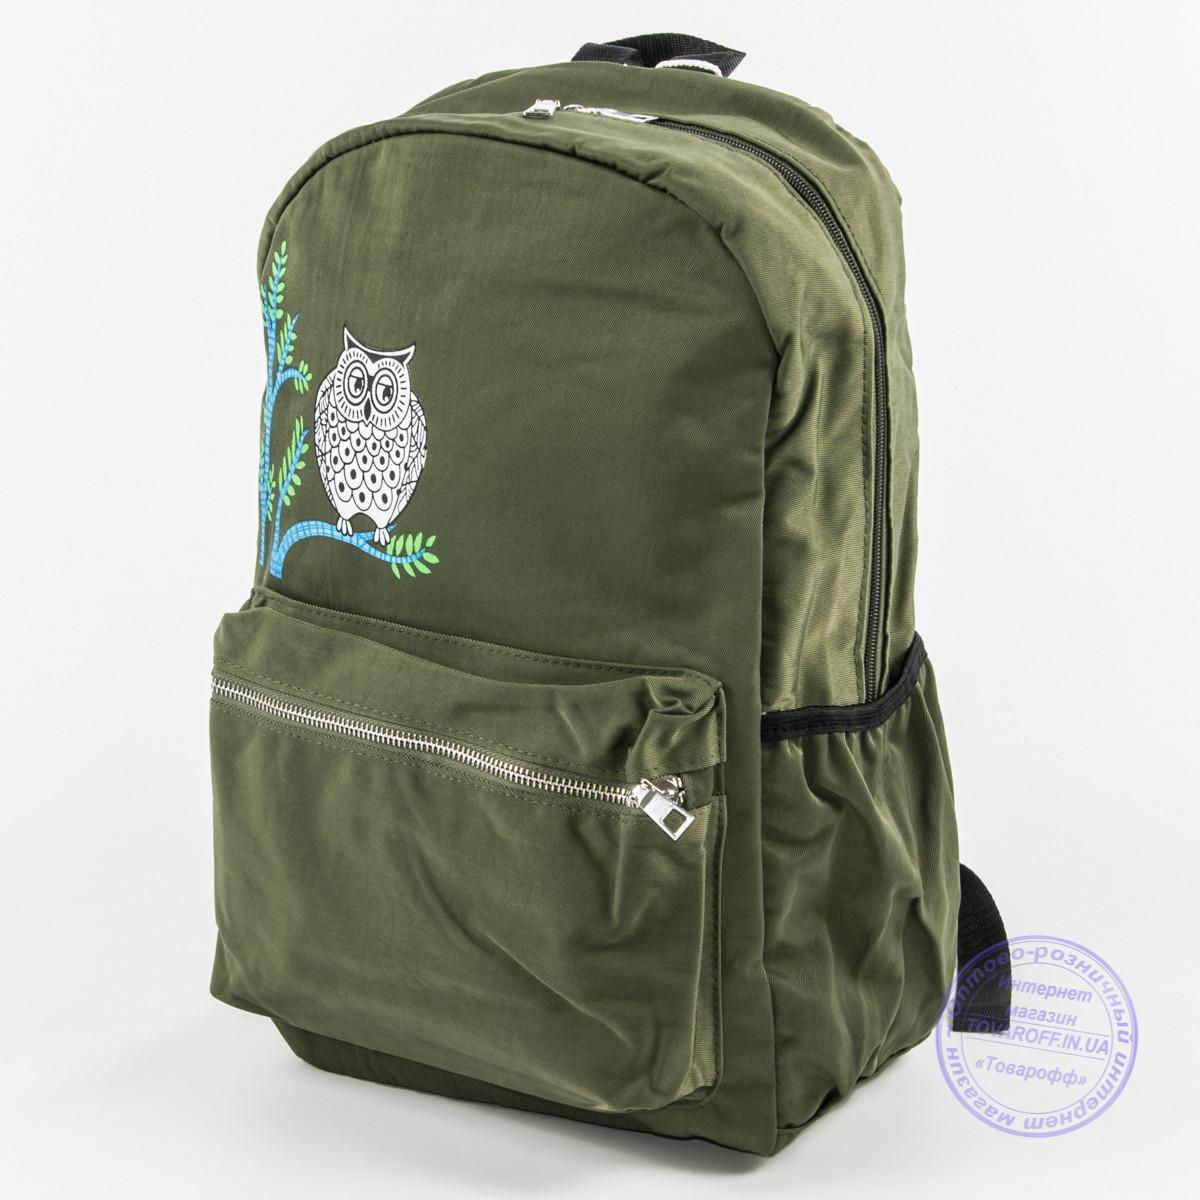 Рюкзаки для школы новинки в украине рюкзак для рыбалки aguatic